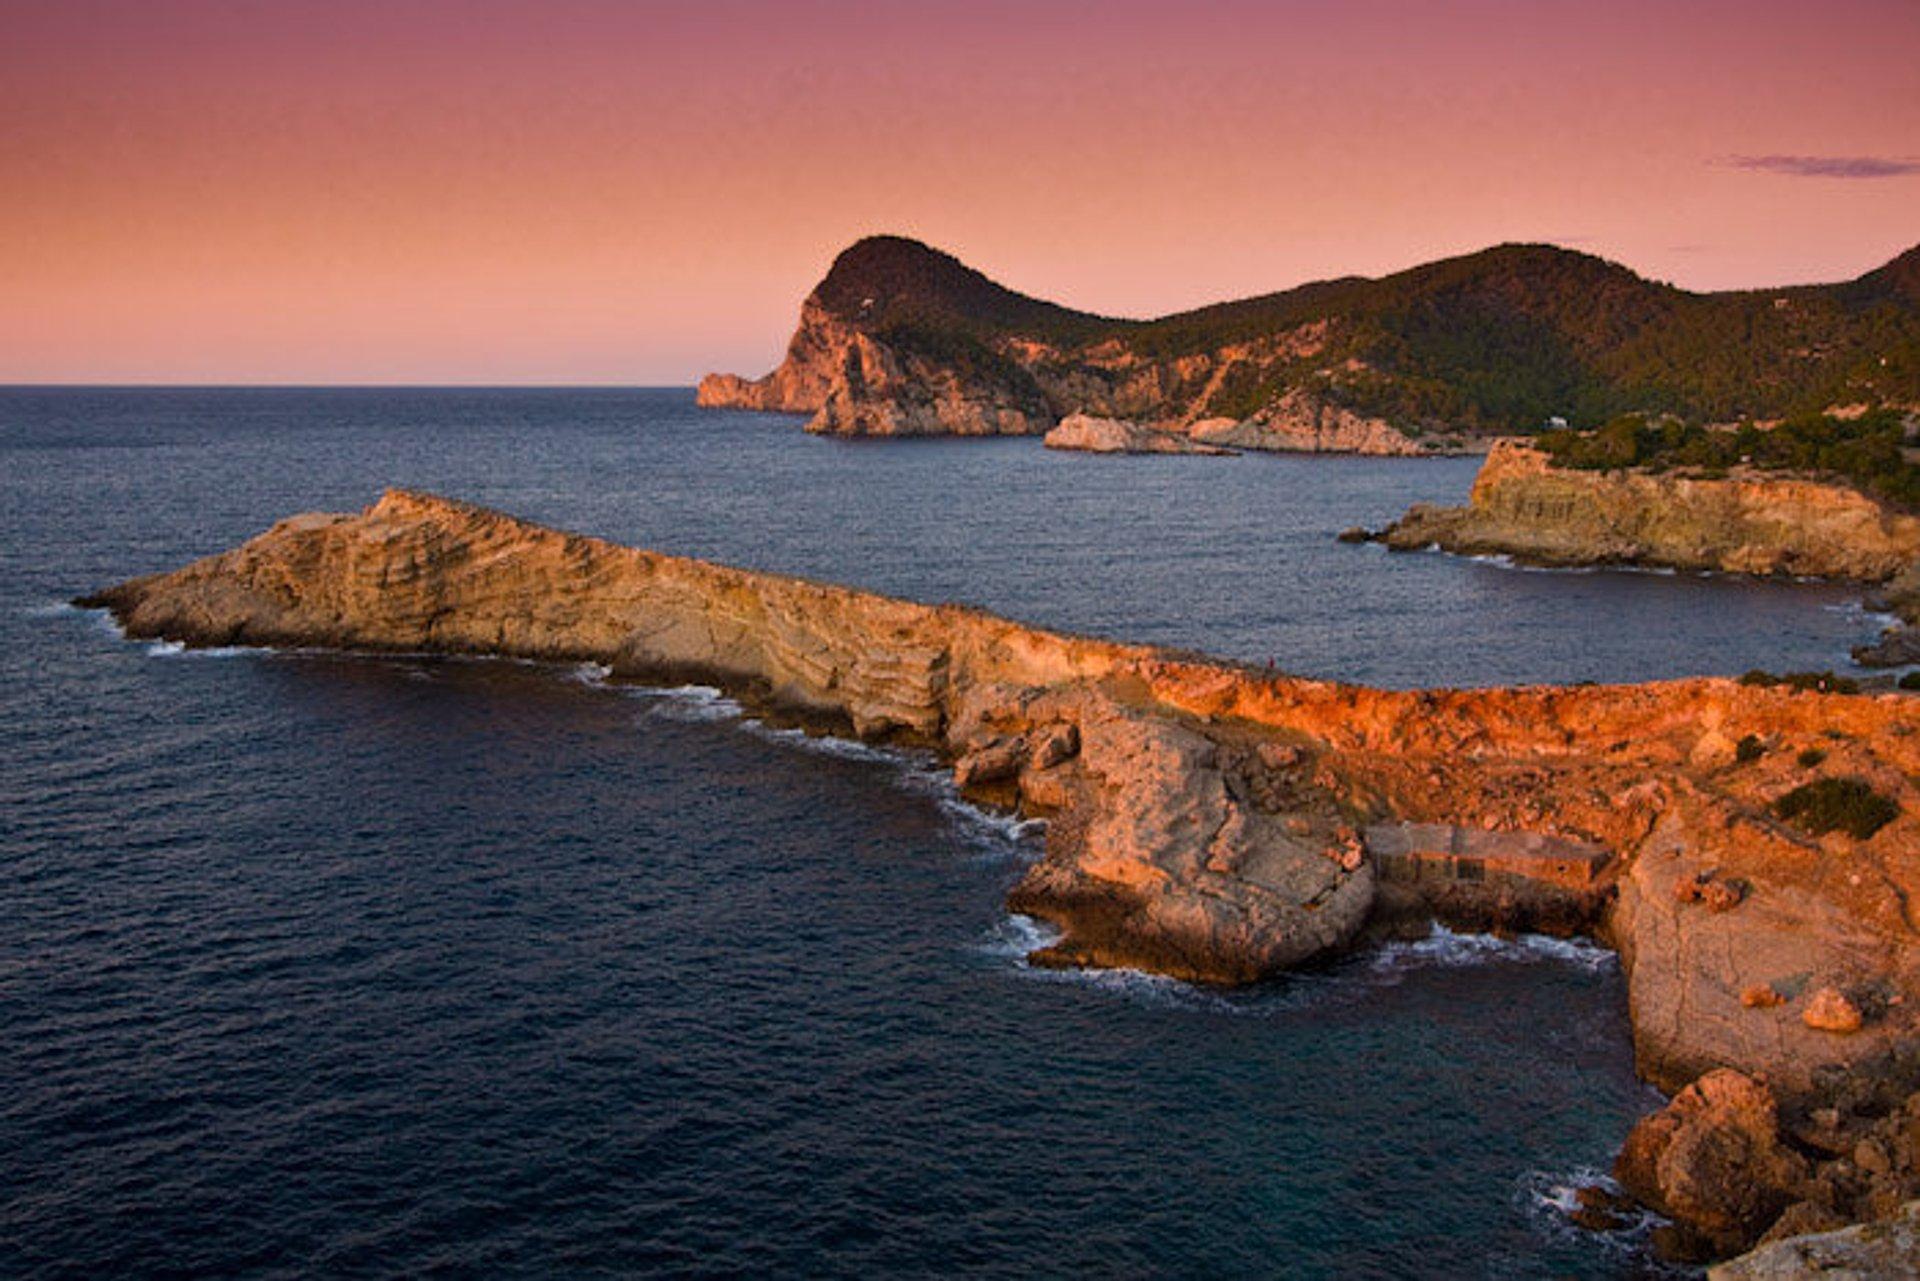 Trekking in Ibiza in Ibiza 2020 - Best Time